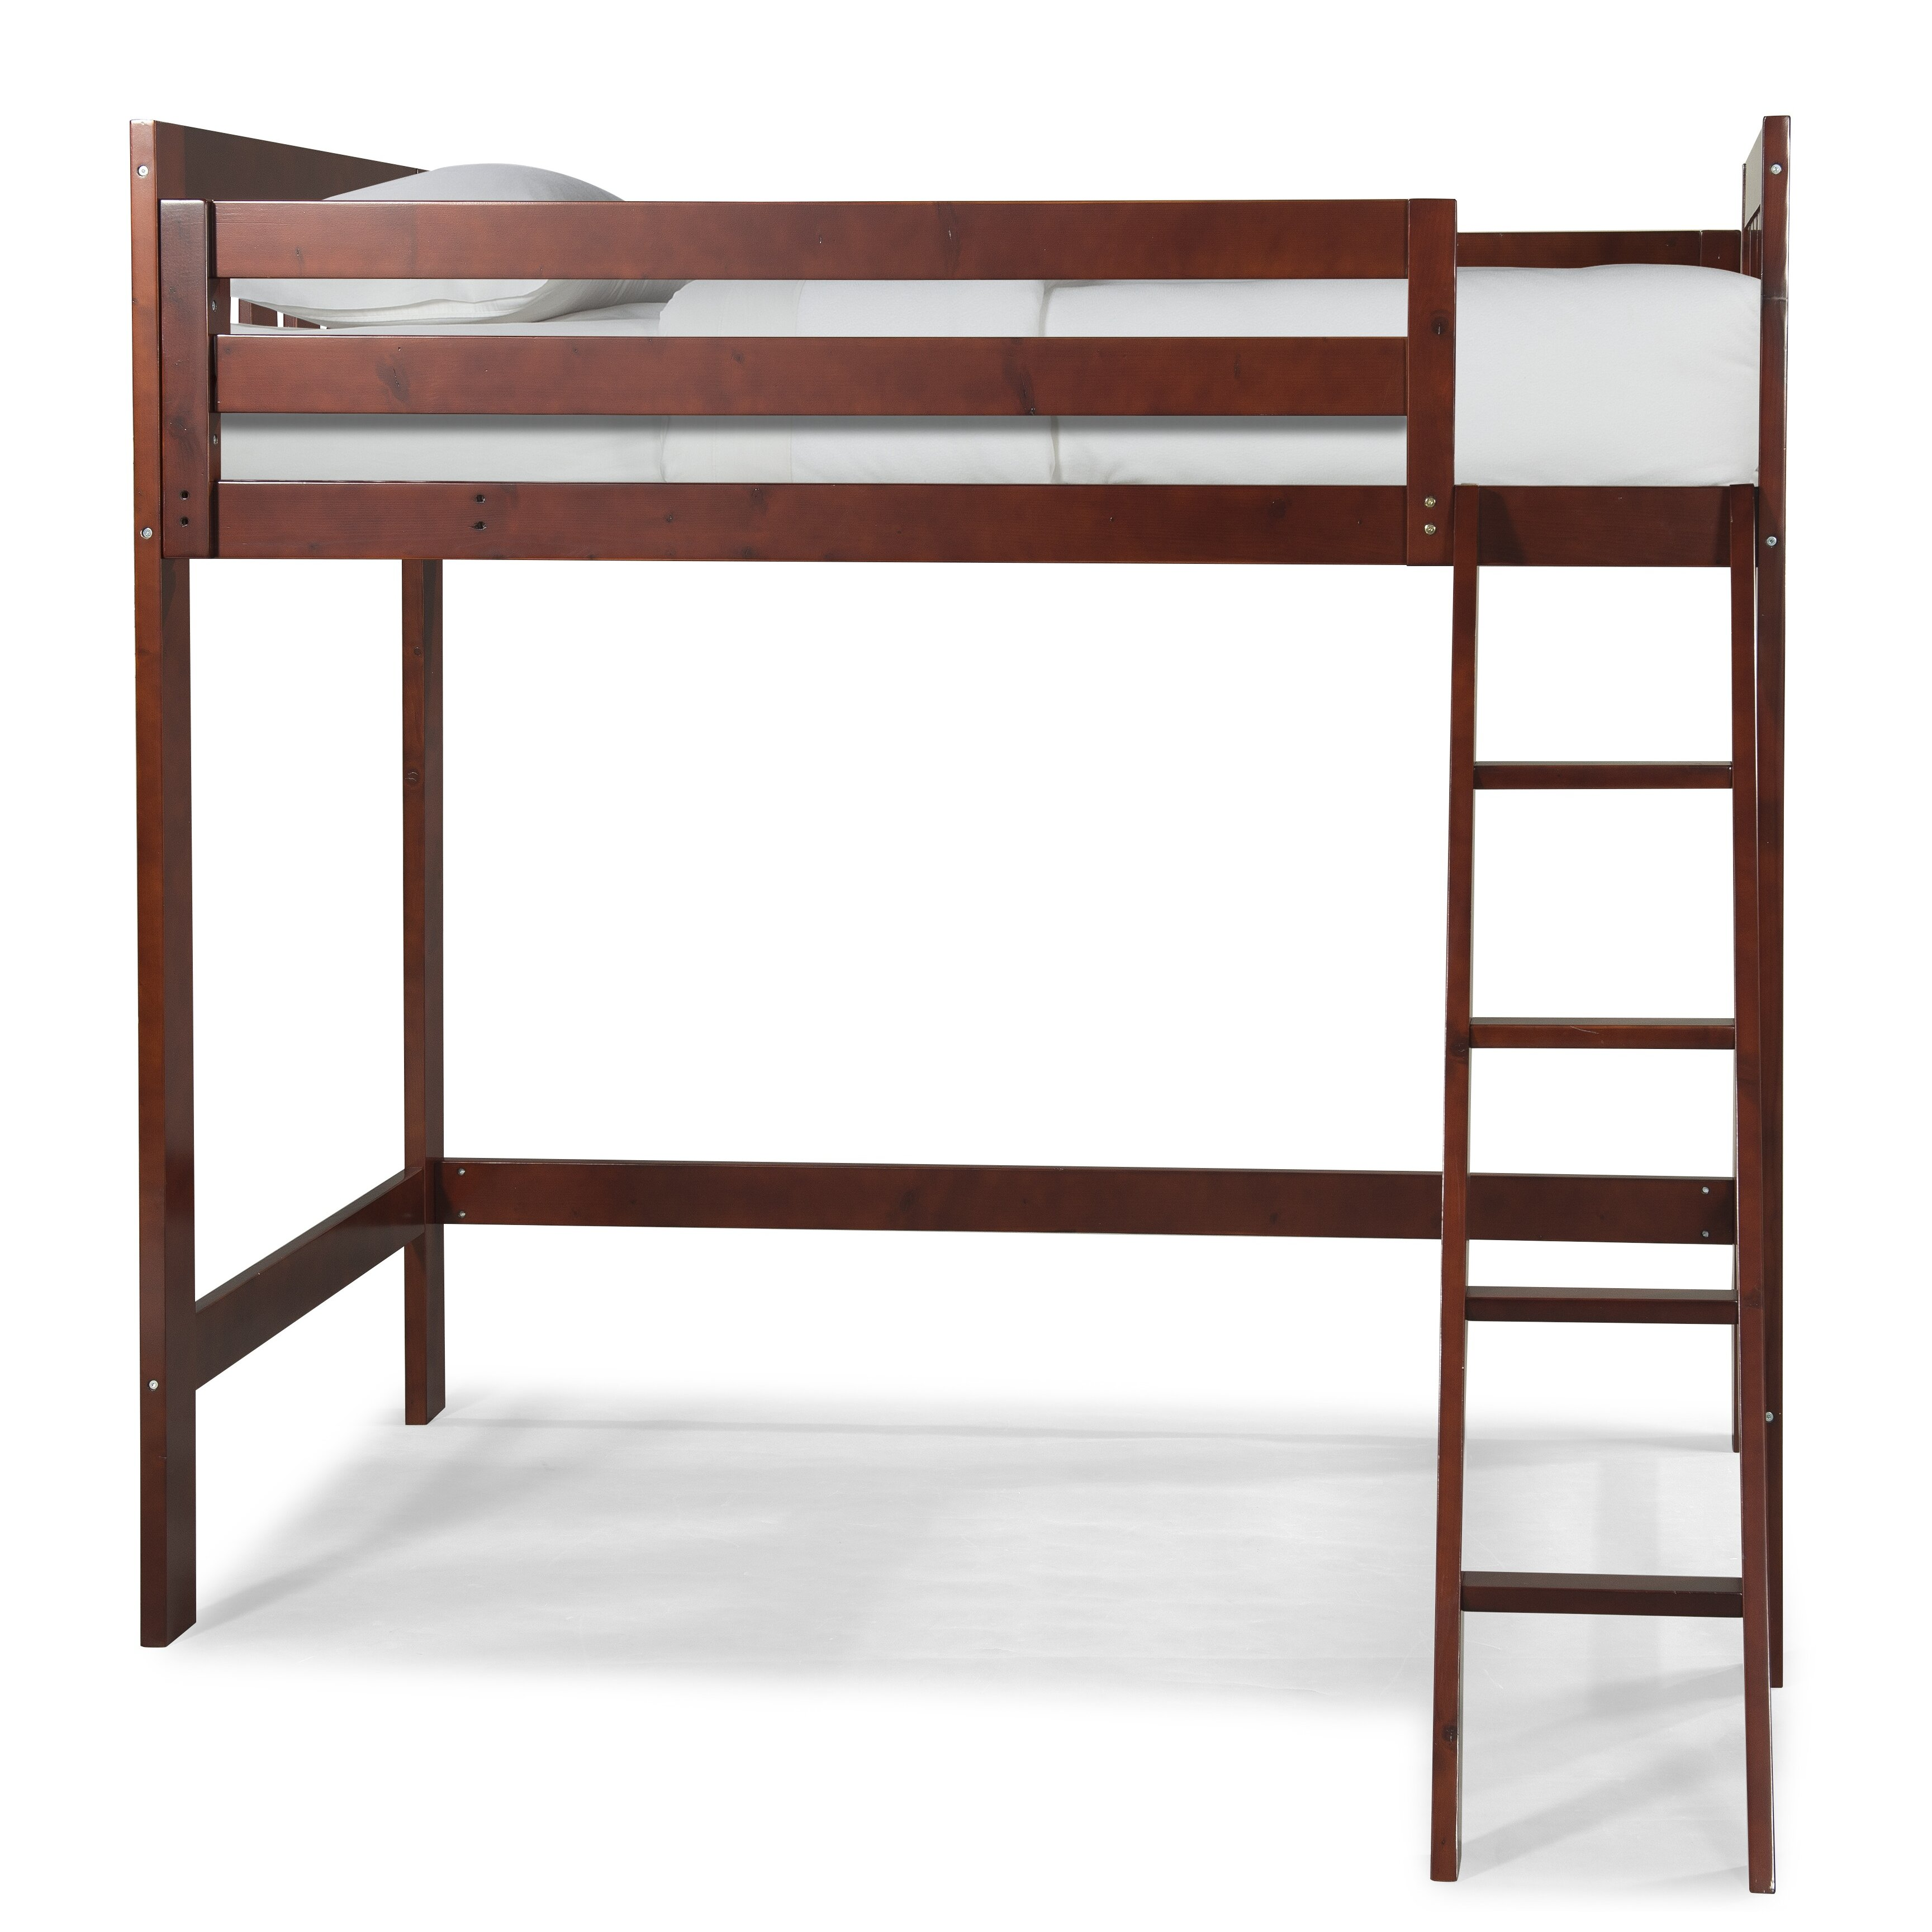 Canwood furniture lakecrest twin loft bed reviews wayfair - Loft furniture ...